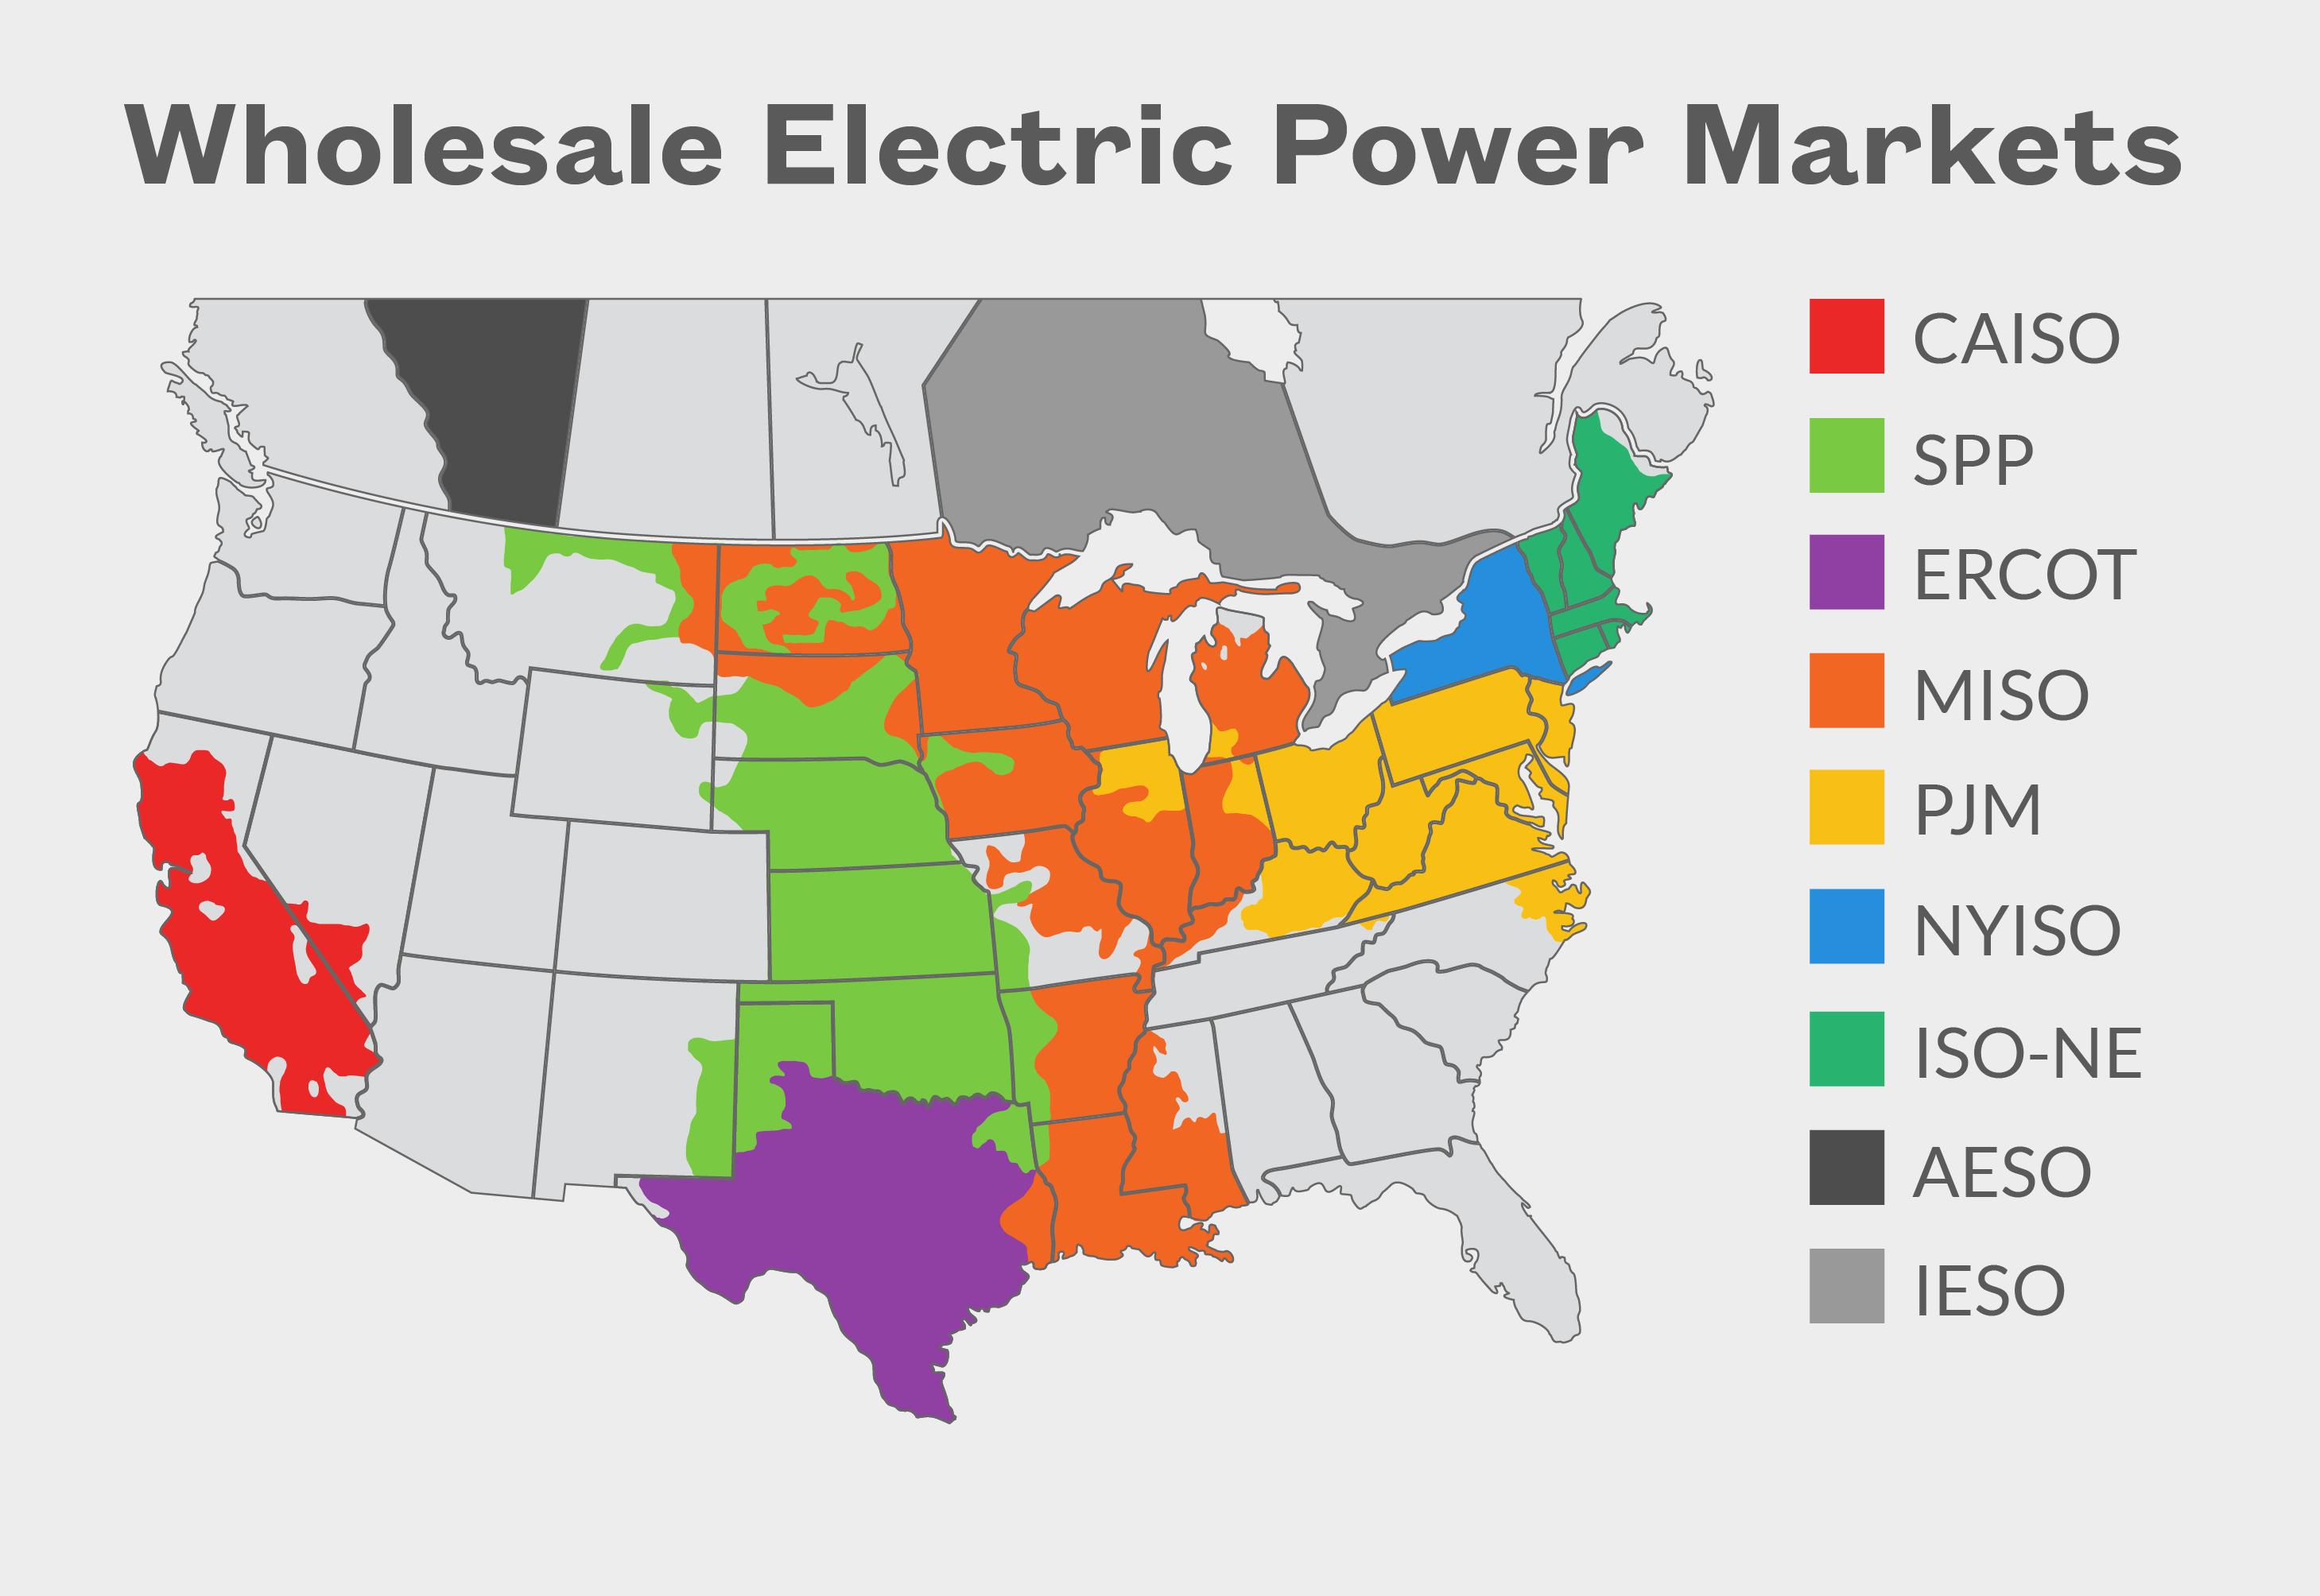 wholesale_electric_power_markets_map